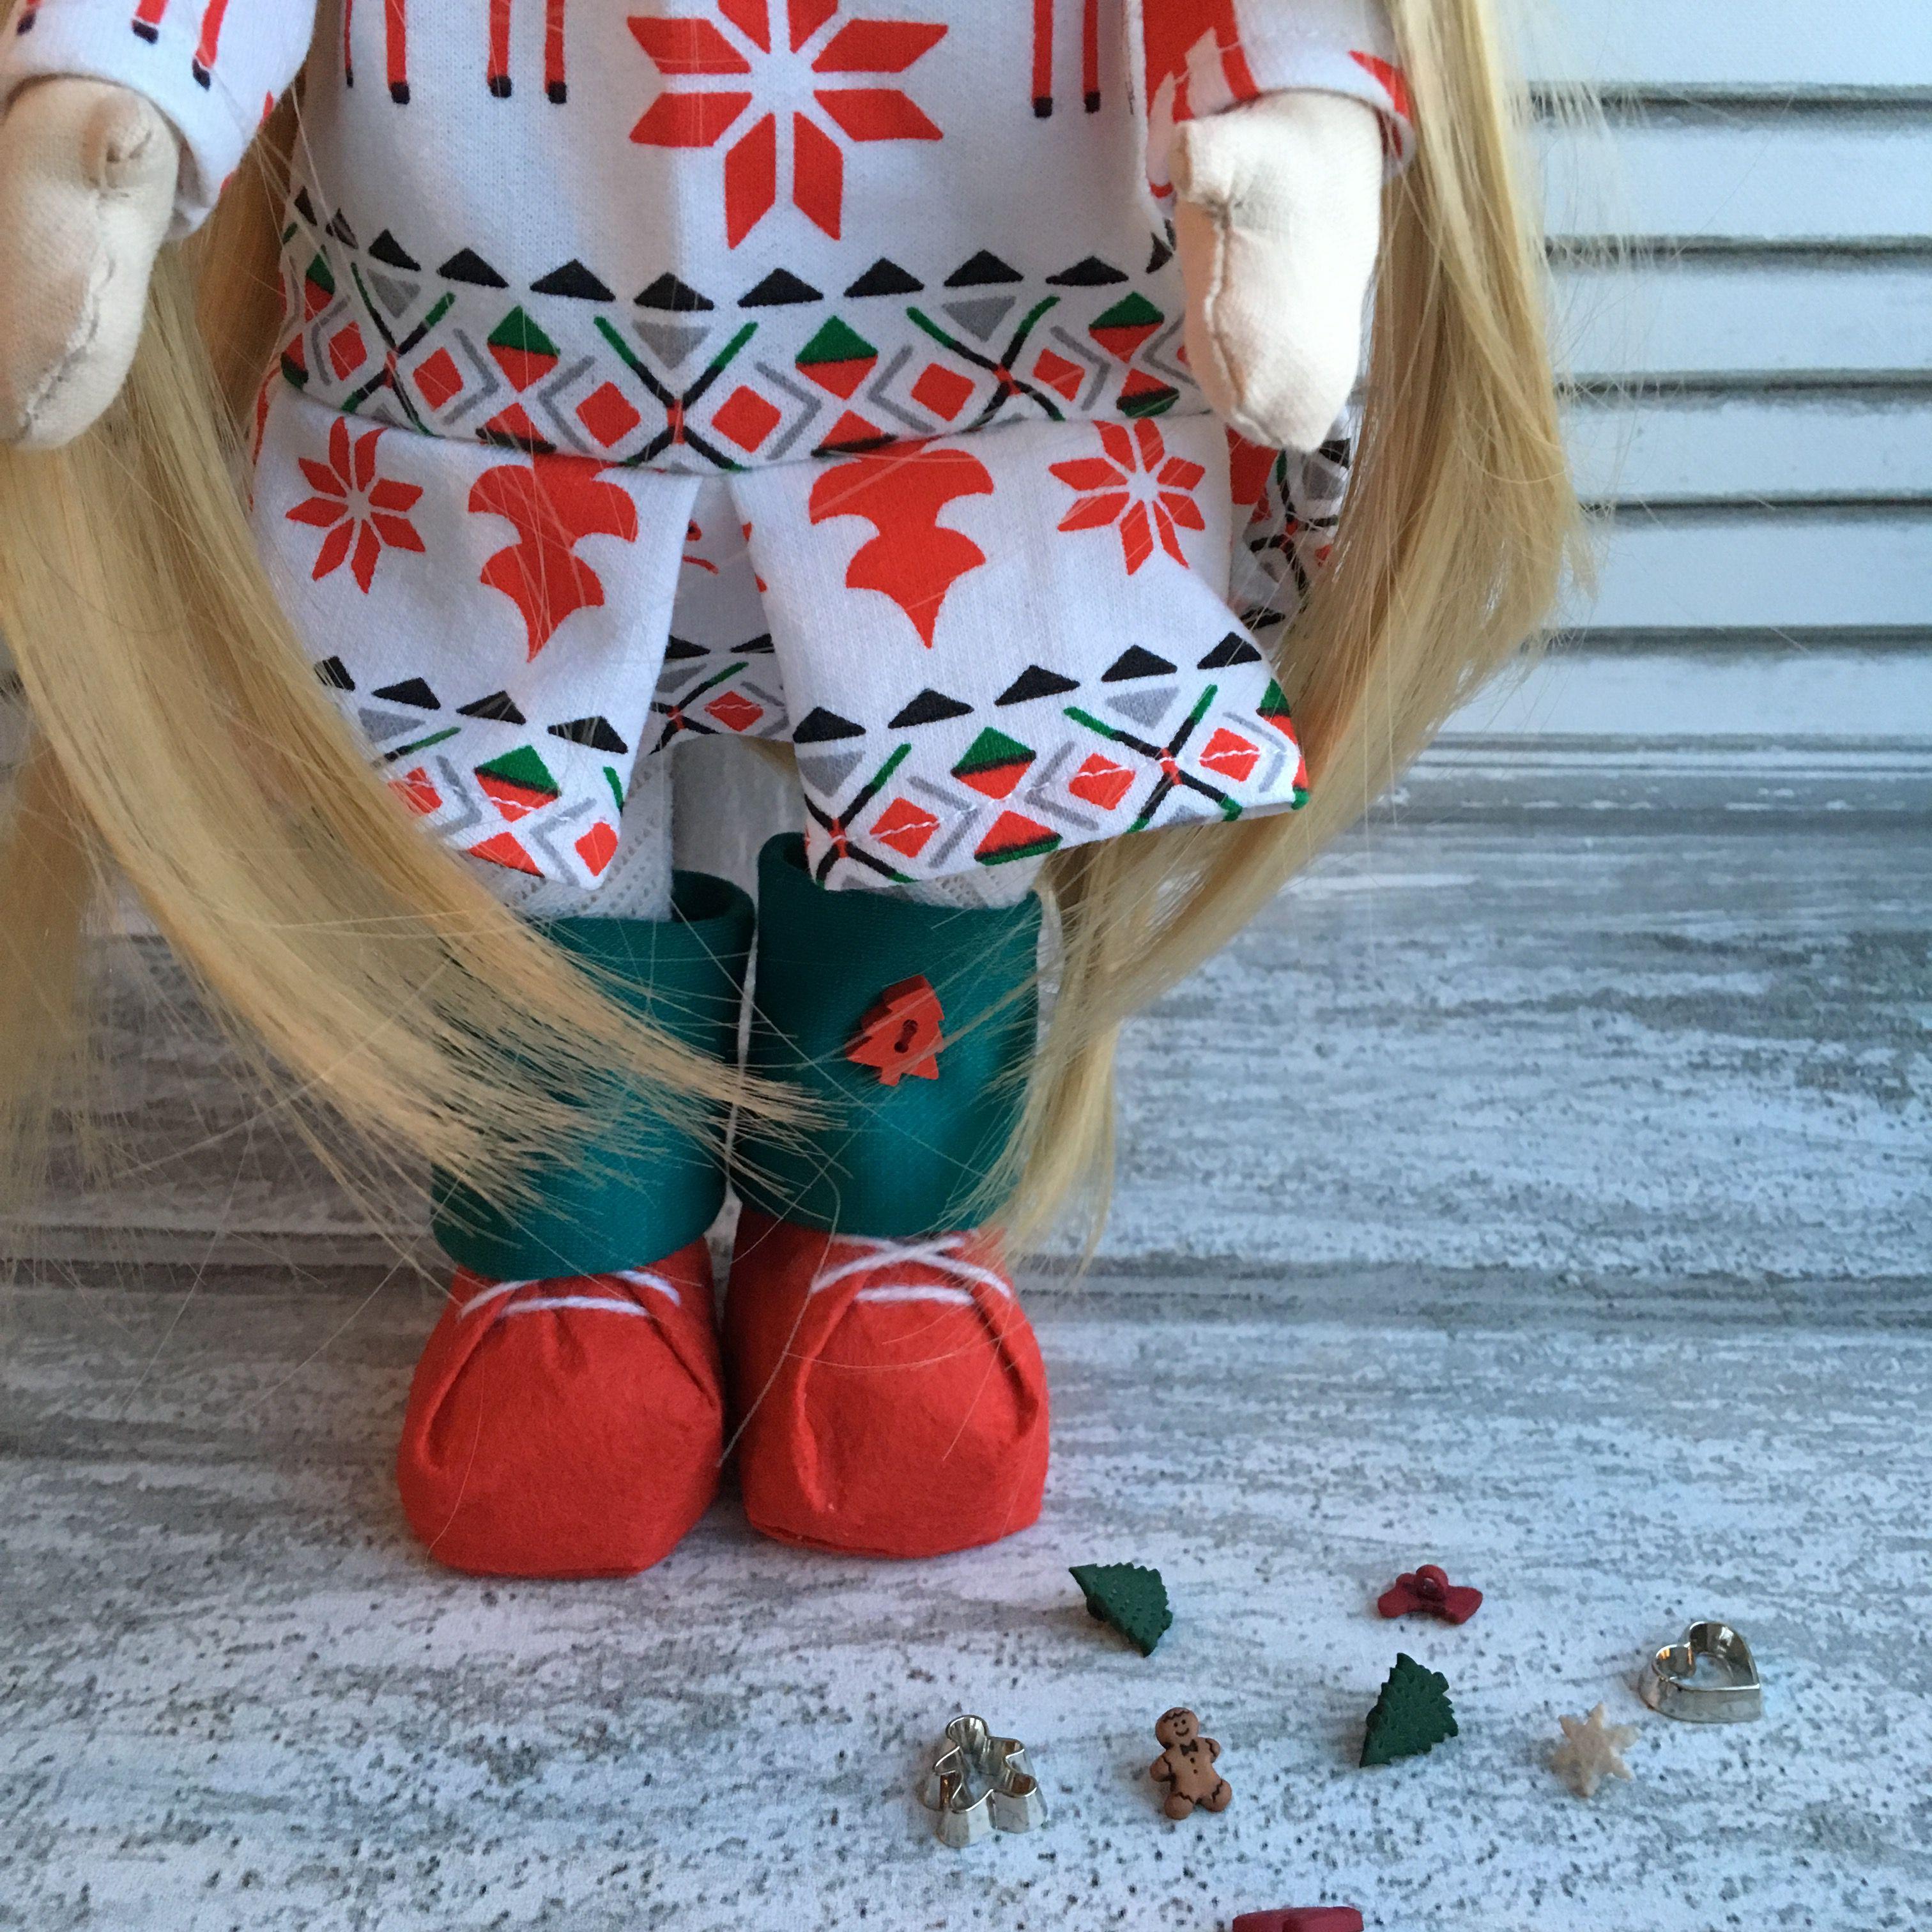 doll ручнаяработа dolls textiledoll кукла рукодельница хендмейд куклавподарок handmade кукларучнойработы куклаизткани подарок текстильнаякукла подарки своимируками